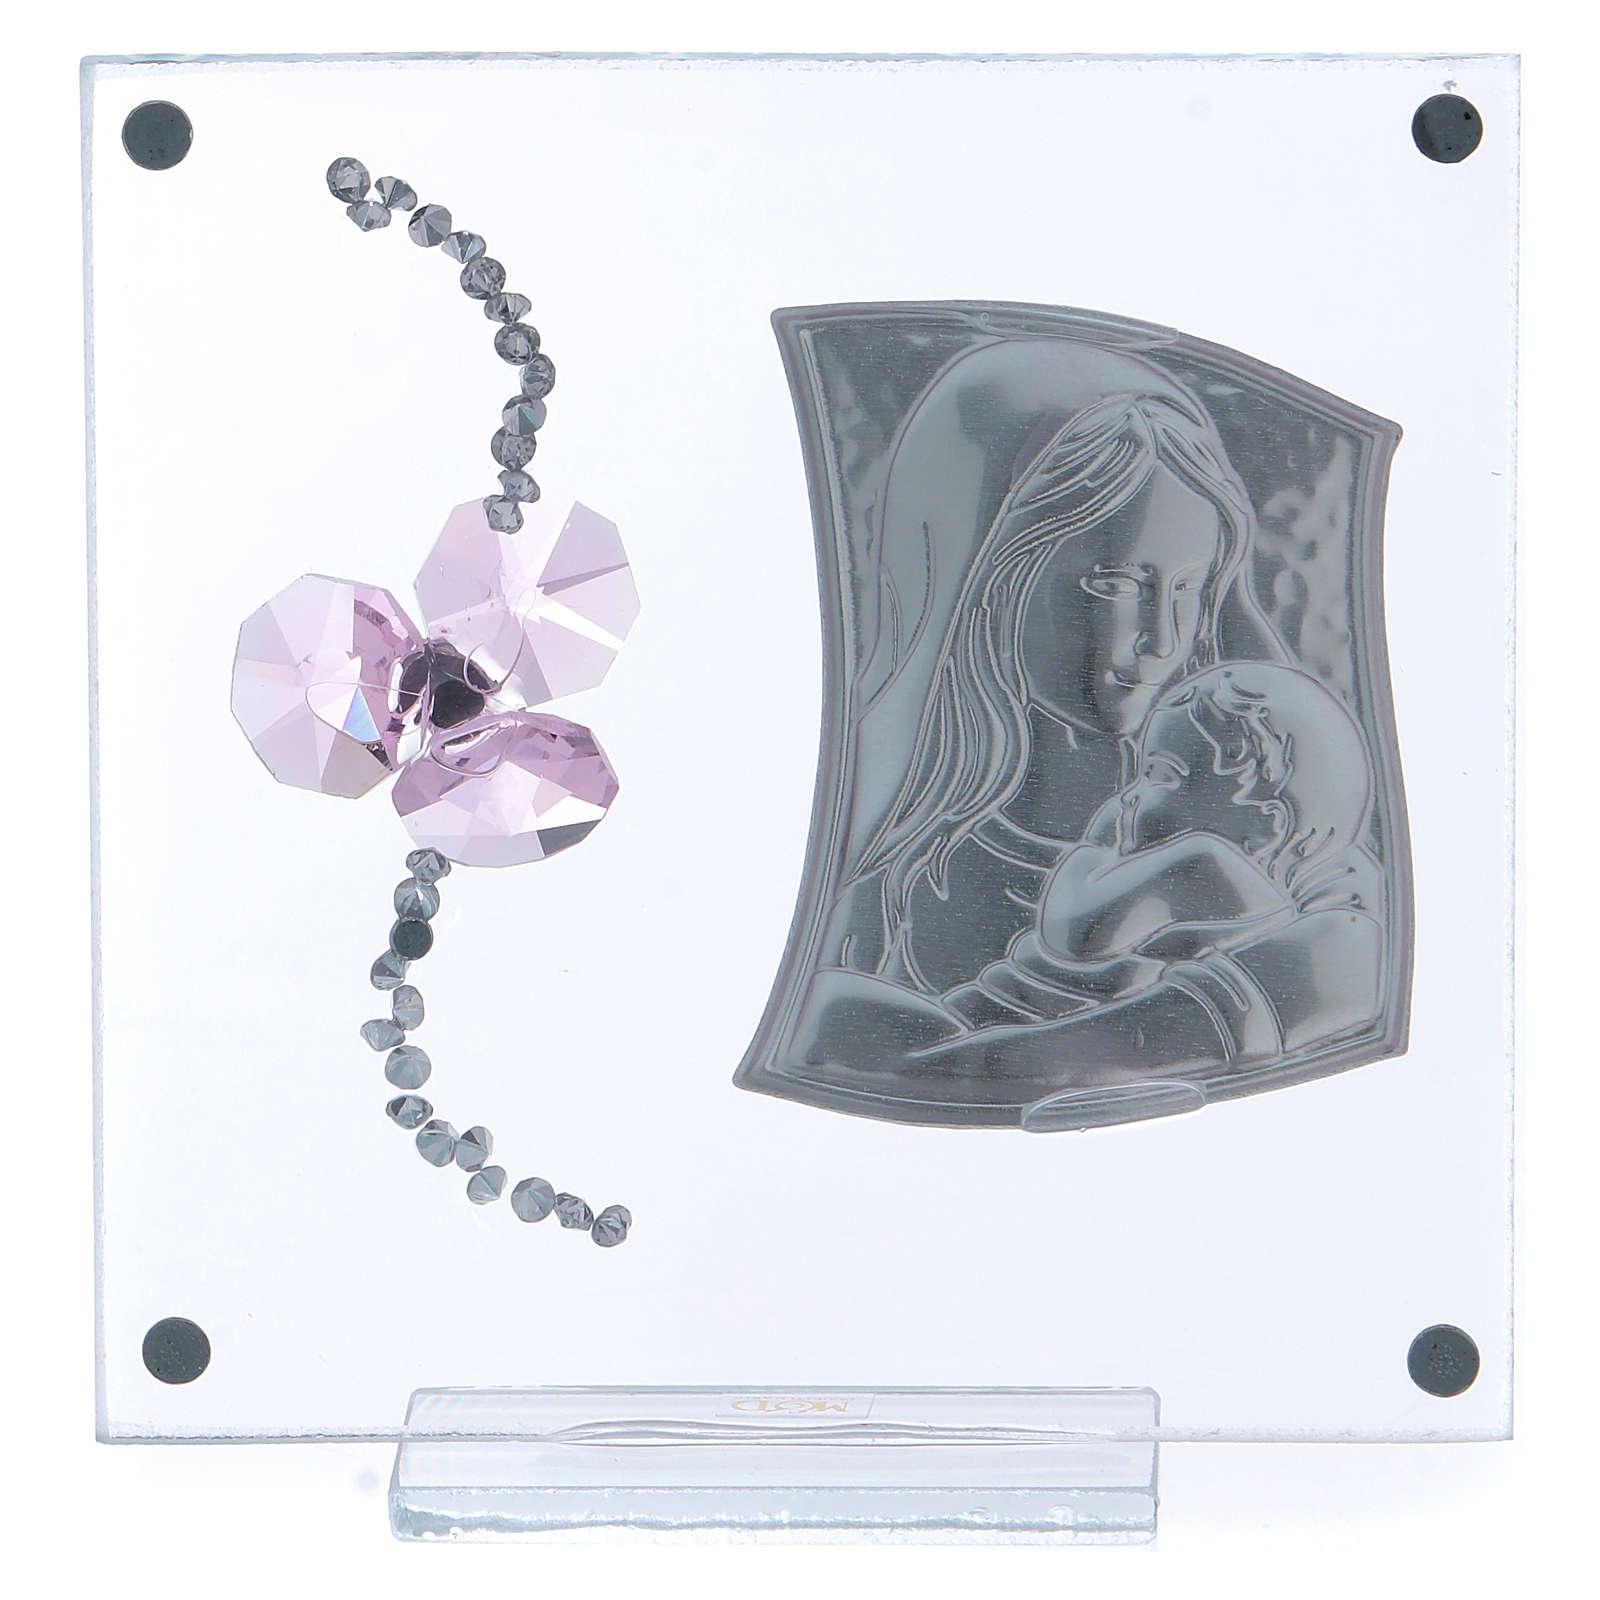 Bombonera Bautismo flor pétalos rosa y maternidad 10x10 cm 3